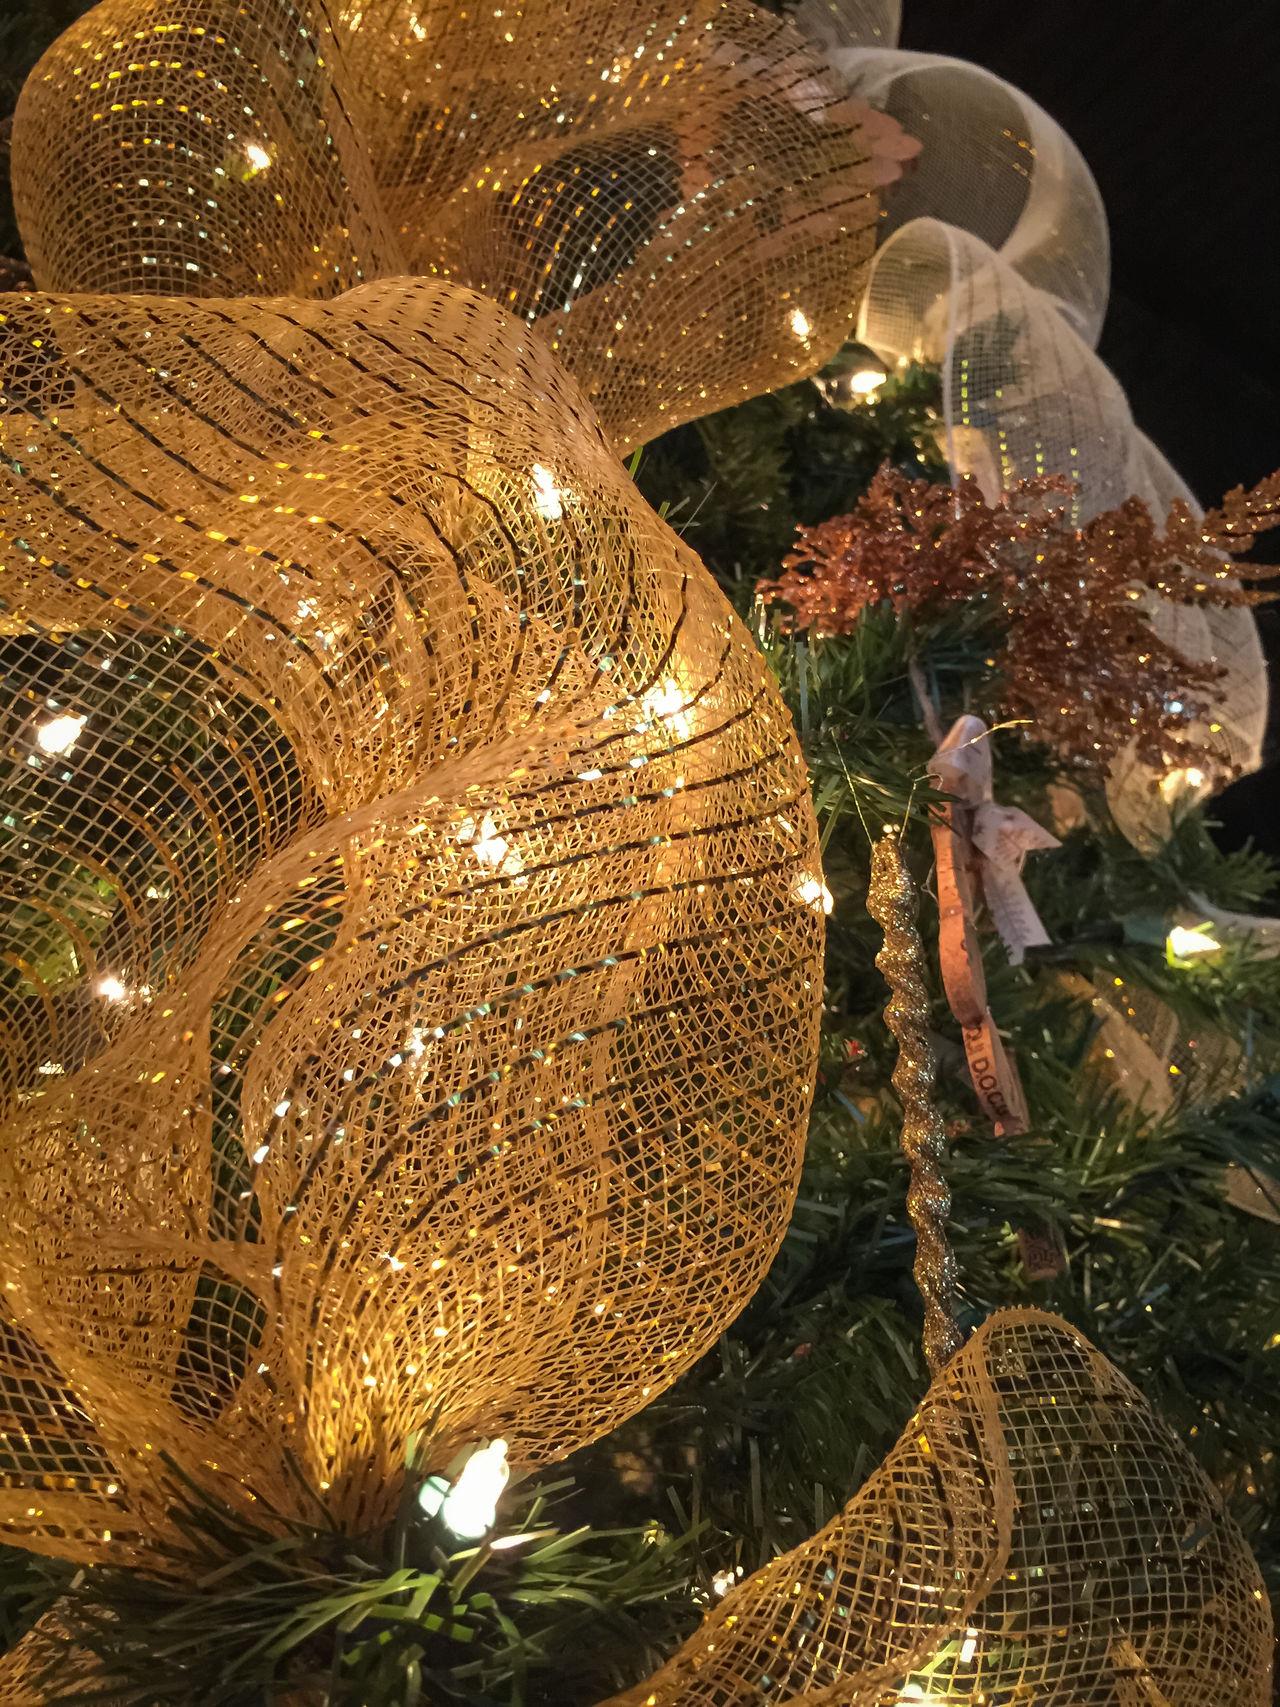 Gold ribbon and christmas tree lights Celebration Christmas Christmas Decoration Christmas Lights Christmas Lights Christmas Ornament Christmastime Close-up Gold Ribbon Illuminated Lacy Day Night No People